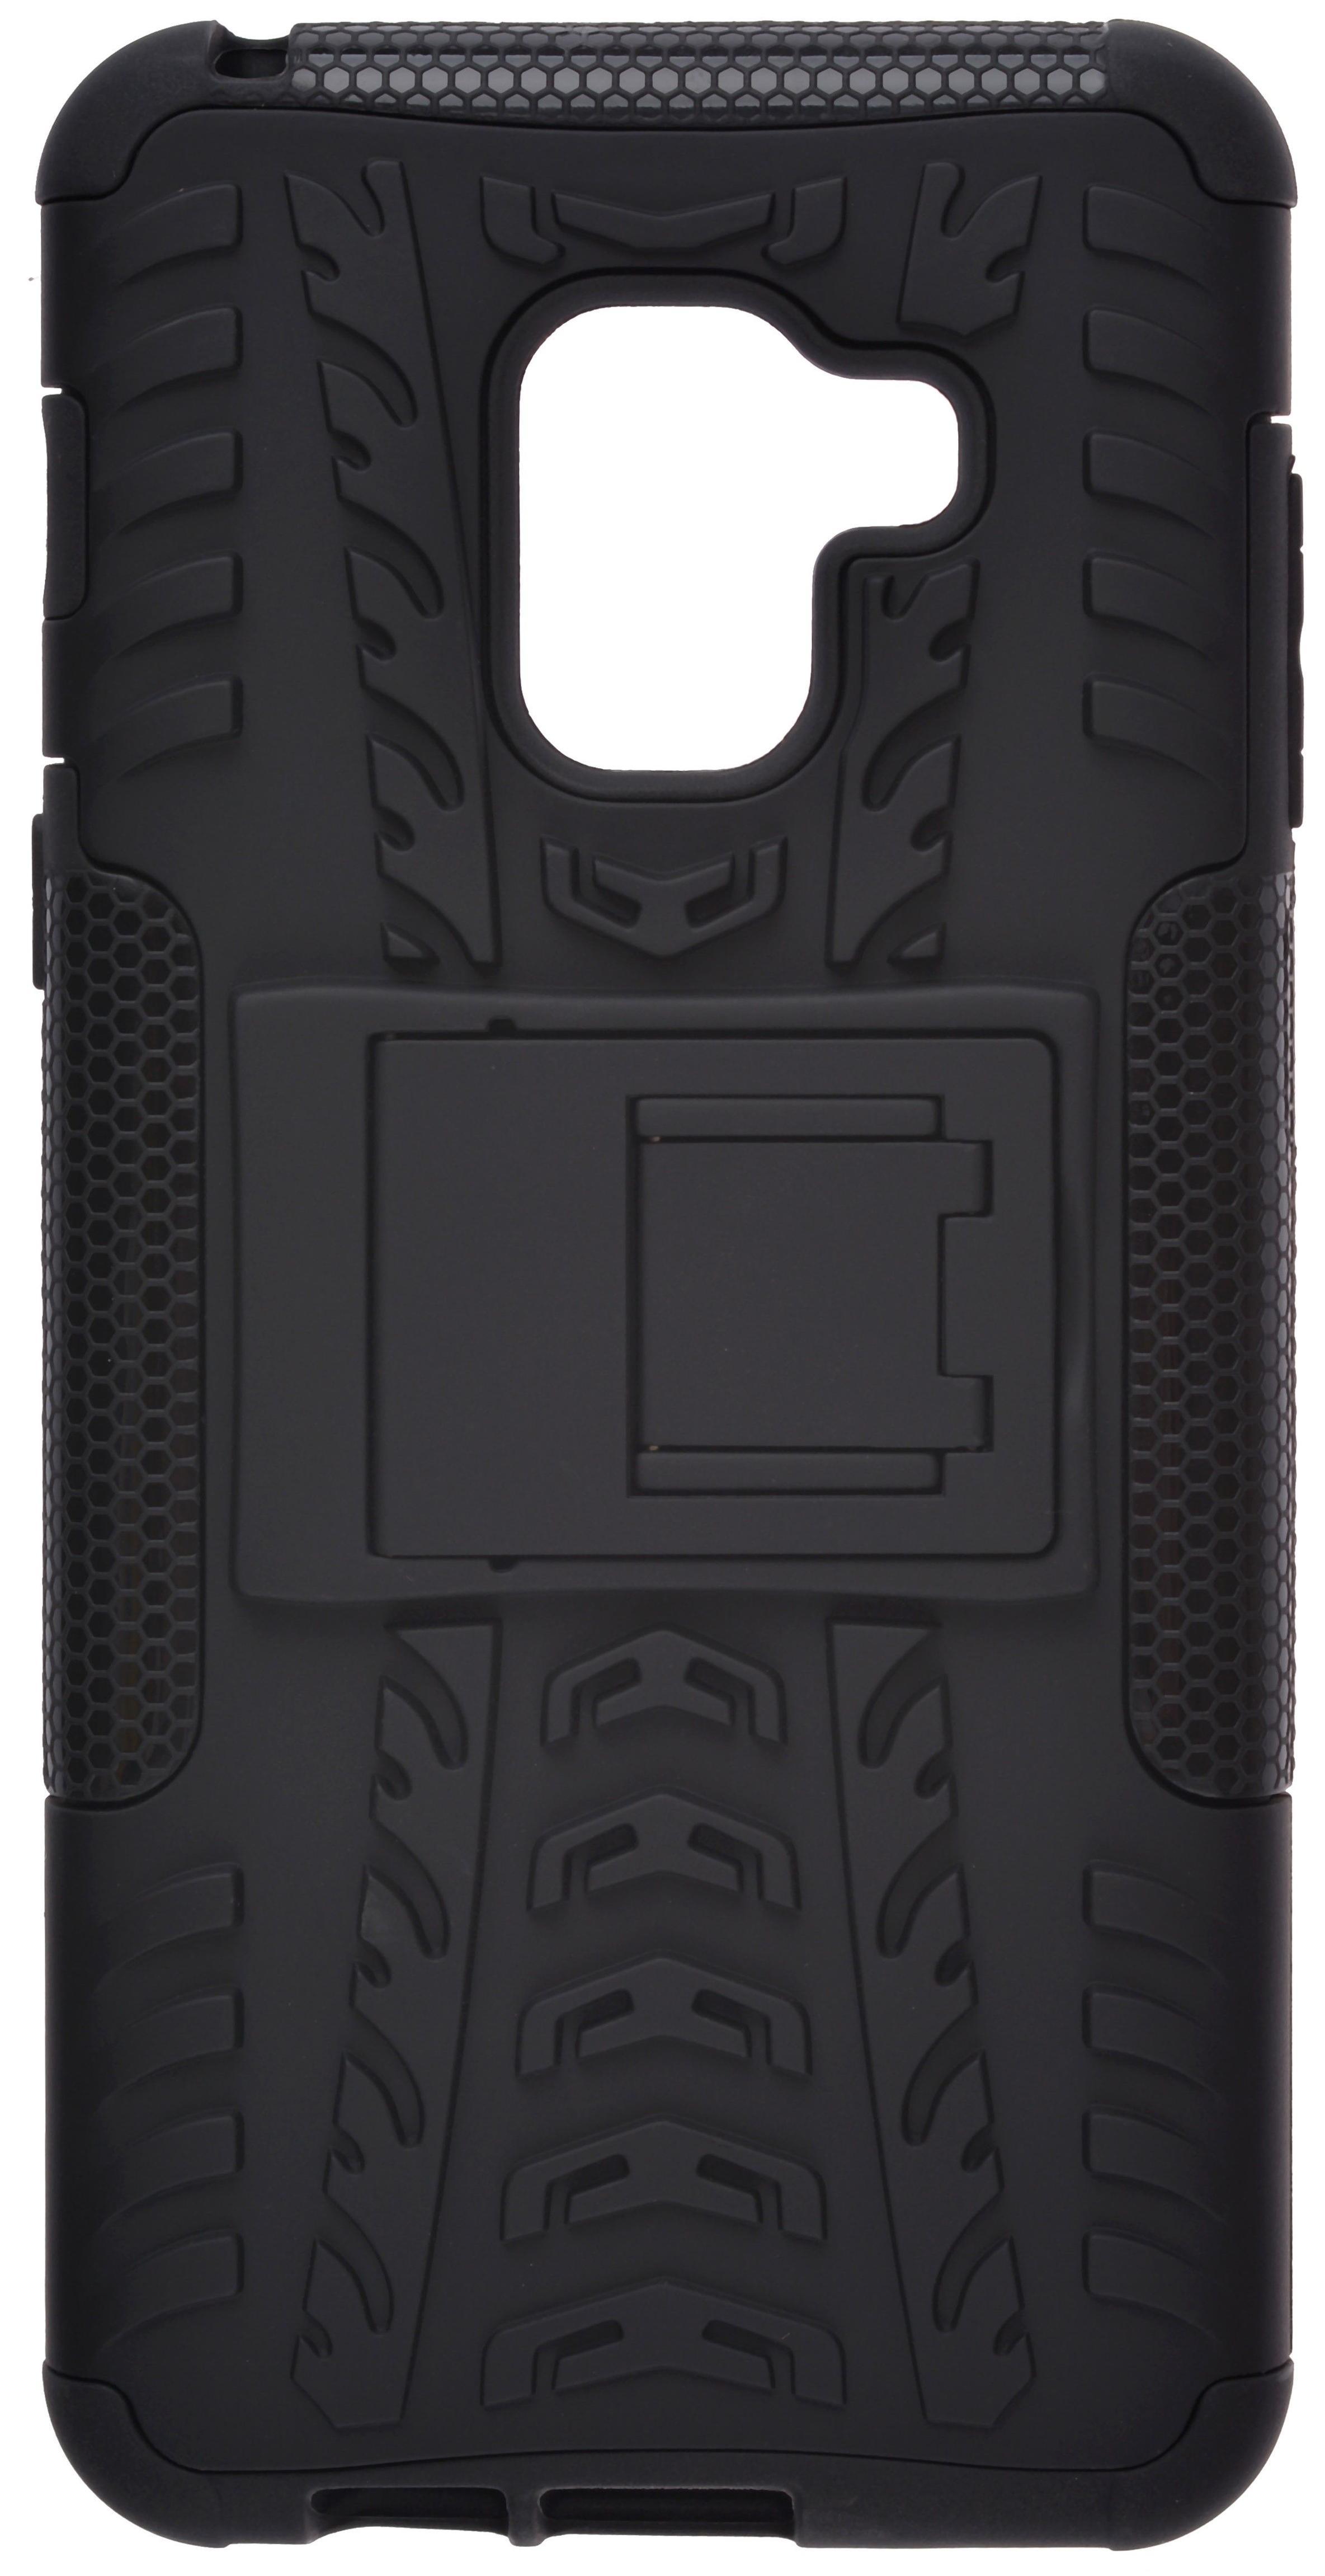 Чехол-накладка skinBOX Defender case для Samsung Galaxy A8 (2018) T-S-SGA82018-06 (4630042520639) Черный Defender case T-S-SGA82018-06 (4630042520639) фото